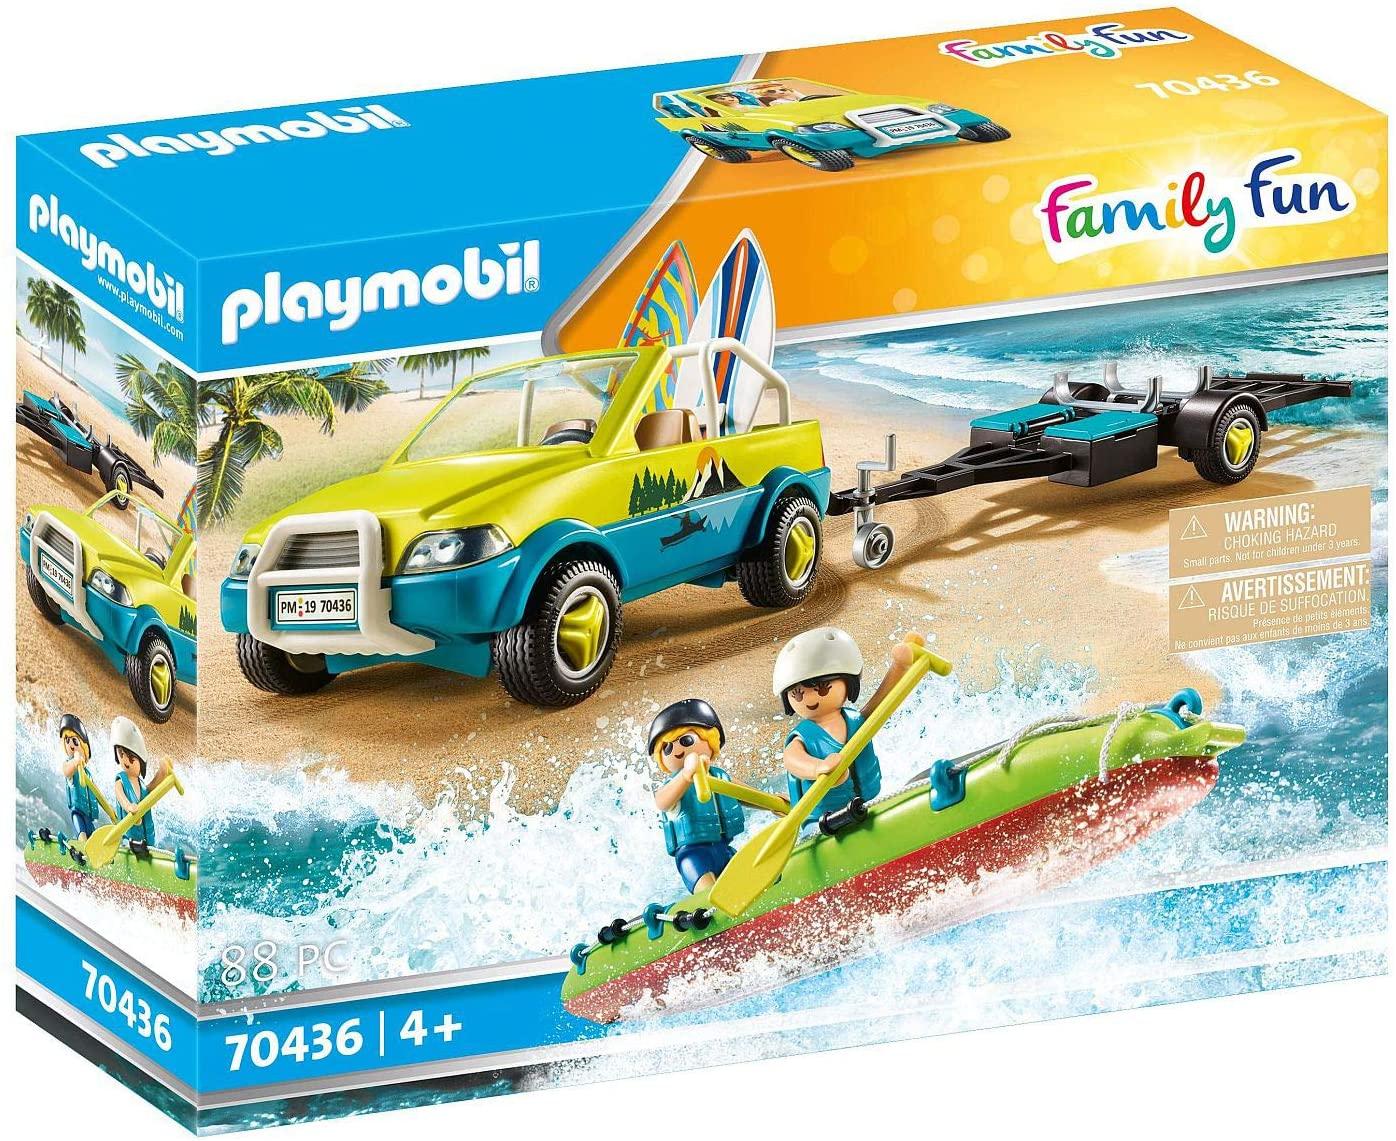 Playmobil Family Fun - Strandauto mit Kanuanhänger für 24,37€ (Müller Abholung)